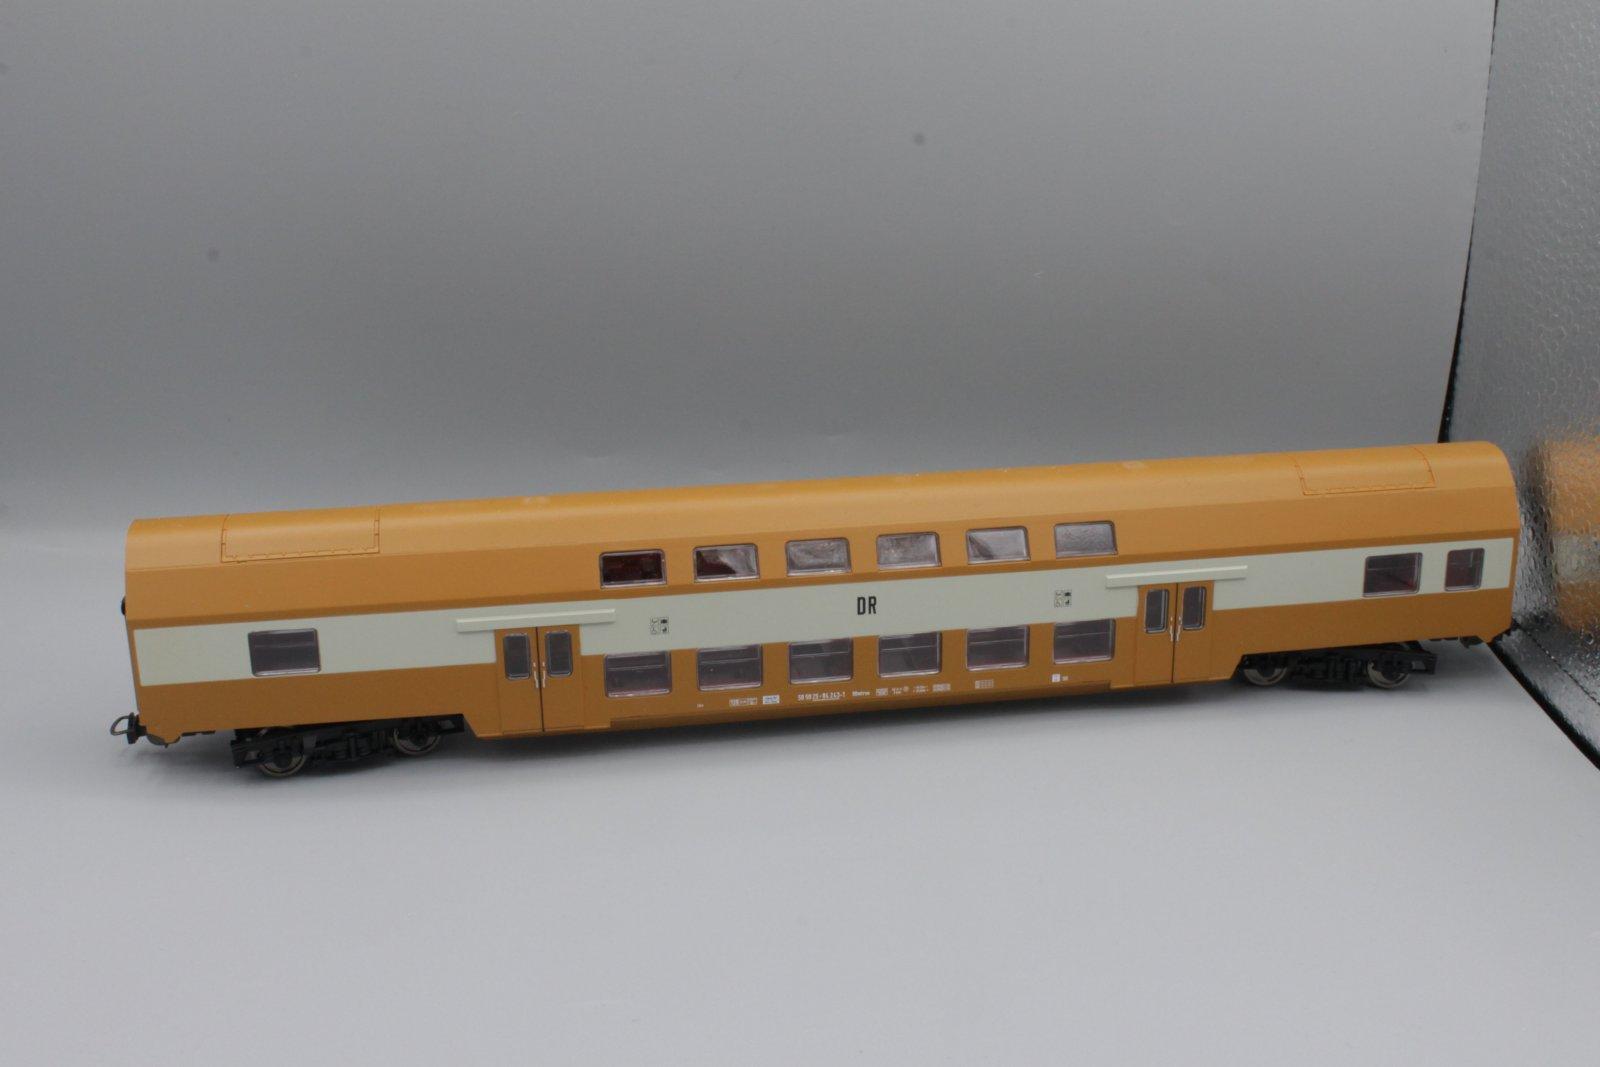 Piko H0 2. Kl. Doppelstockwagen DR sandgelb DBmtrue DR Neuware wie 57622 (2)